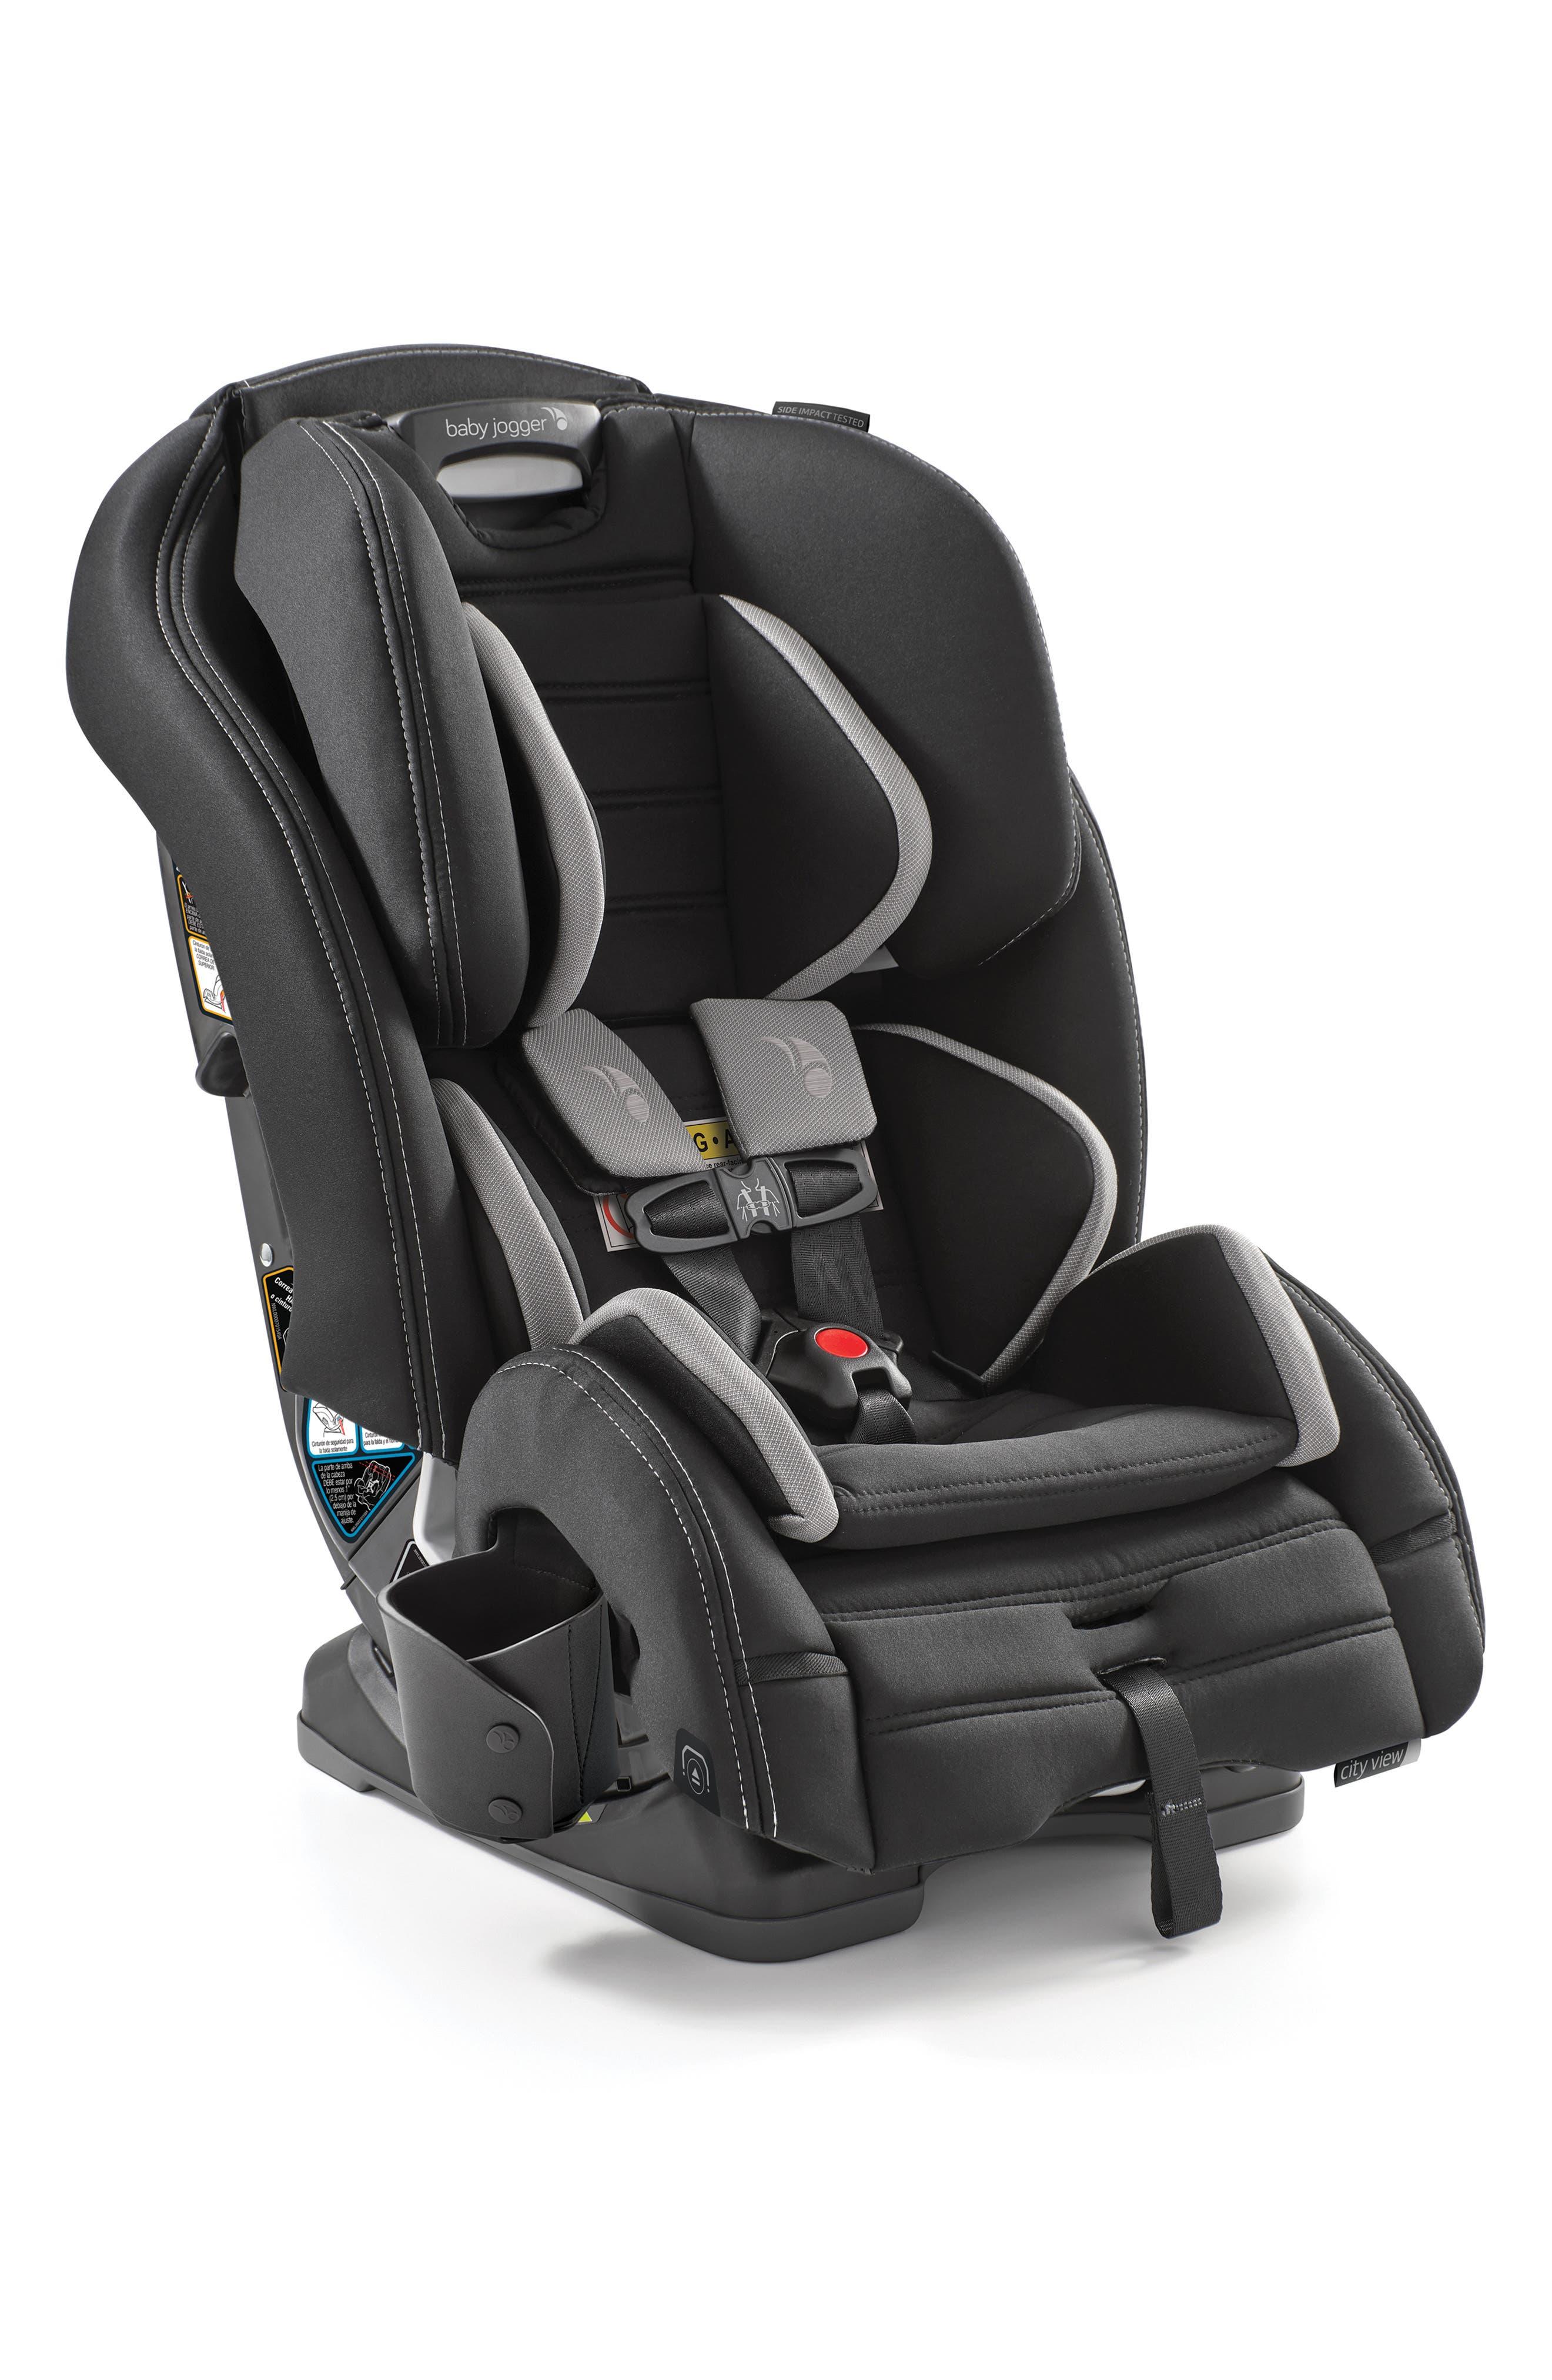 City View 2018 Convertible Car Seat,                             Alternate thumbnail 7, color,                             BLACK/ MONUMENT